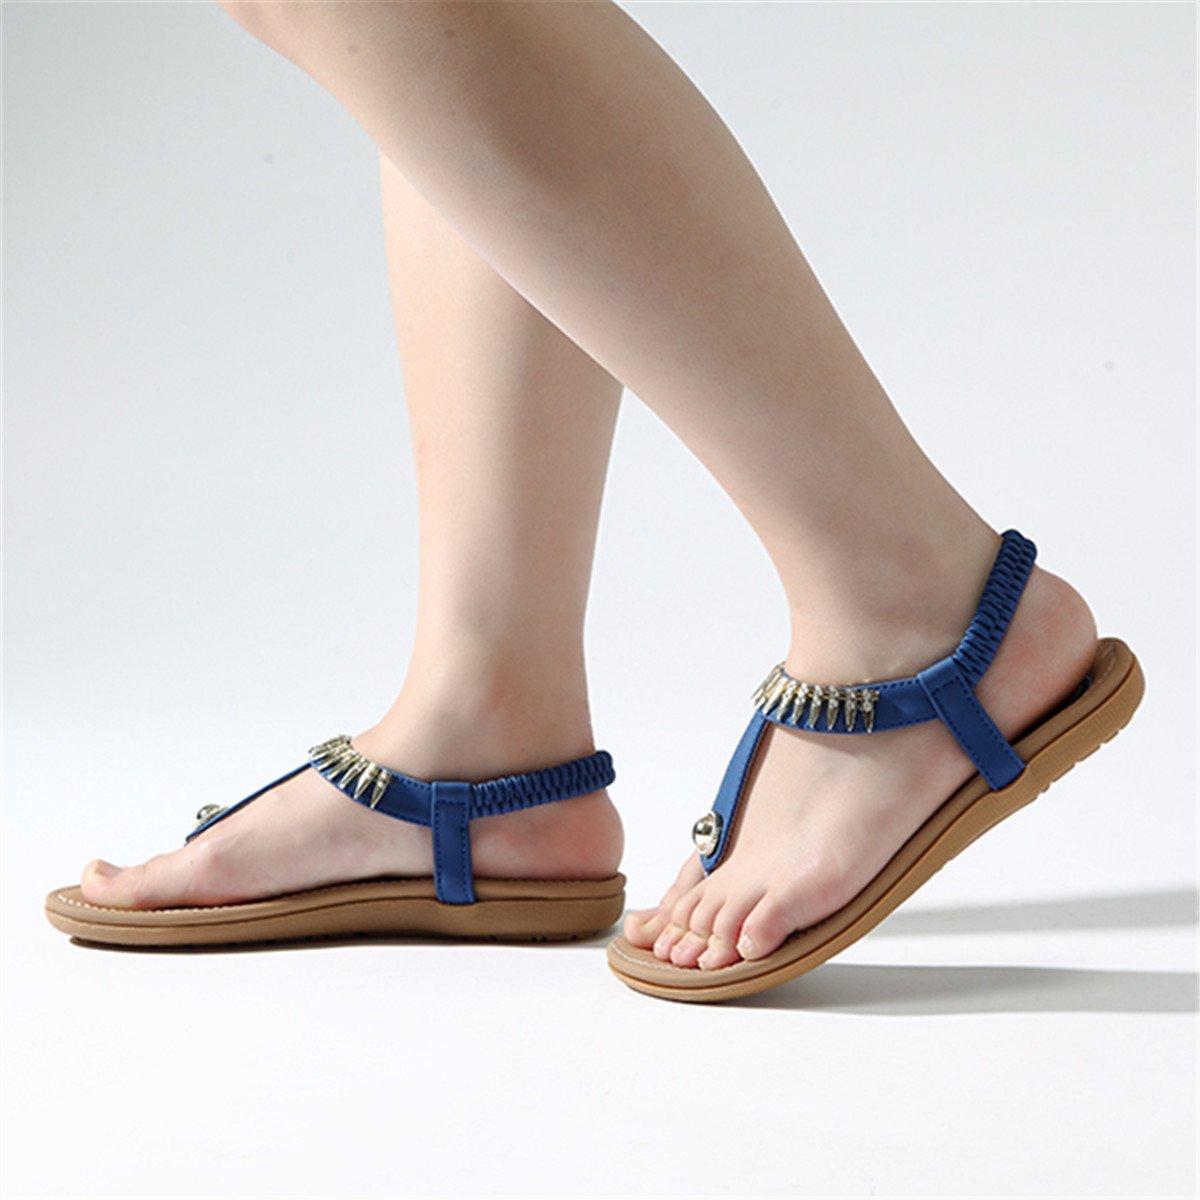 Socofy Bohemian Sandals,Women's Metal Elastic Flat Sandals Summer Bohemia Style Clip Toe Flip Flops Shoes Blue 9 B(M) US by Socofy (Image #7)